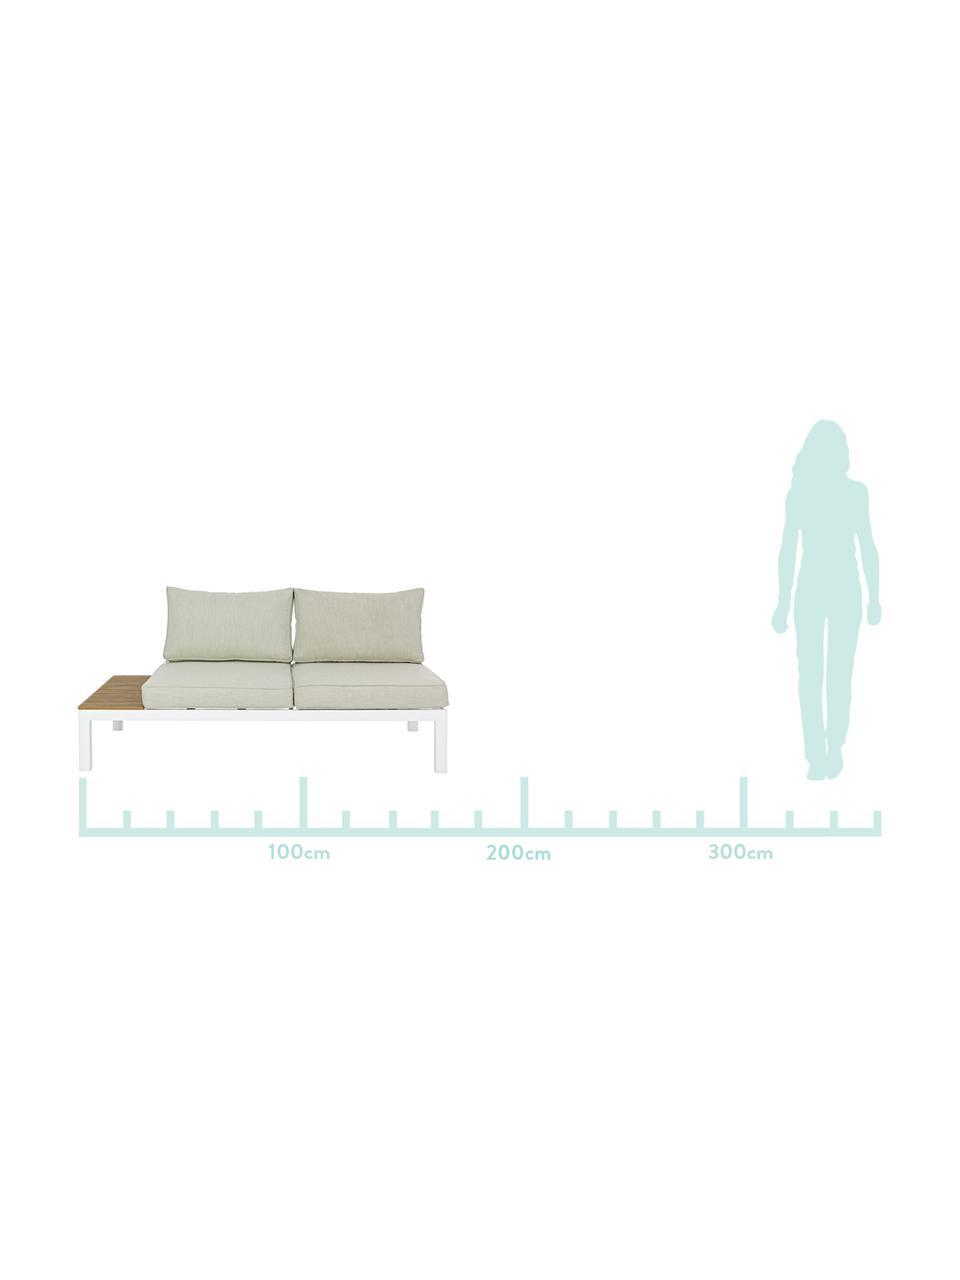 Garten-Lounge-Set Elias, 4-tlg., Gestell: Aluminium, pulverbeschich, Sitzfläche: Sperrholz, beschichtet, Weiß, Teakholz, Beige, Sondergrößen